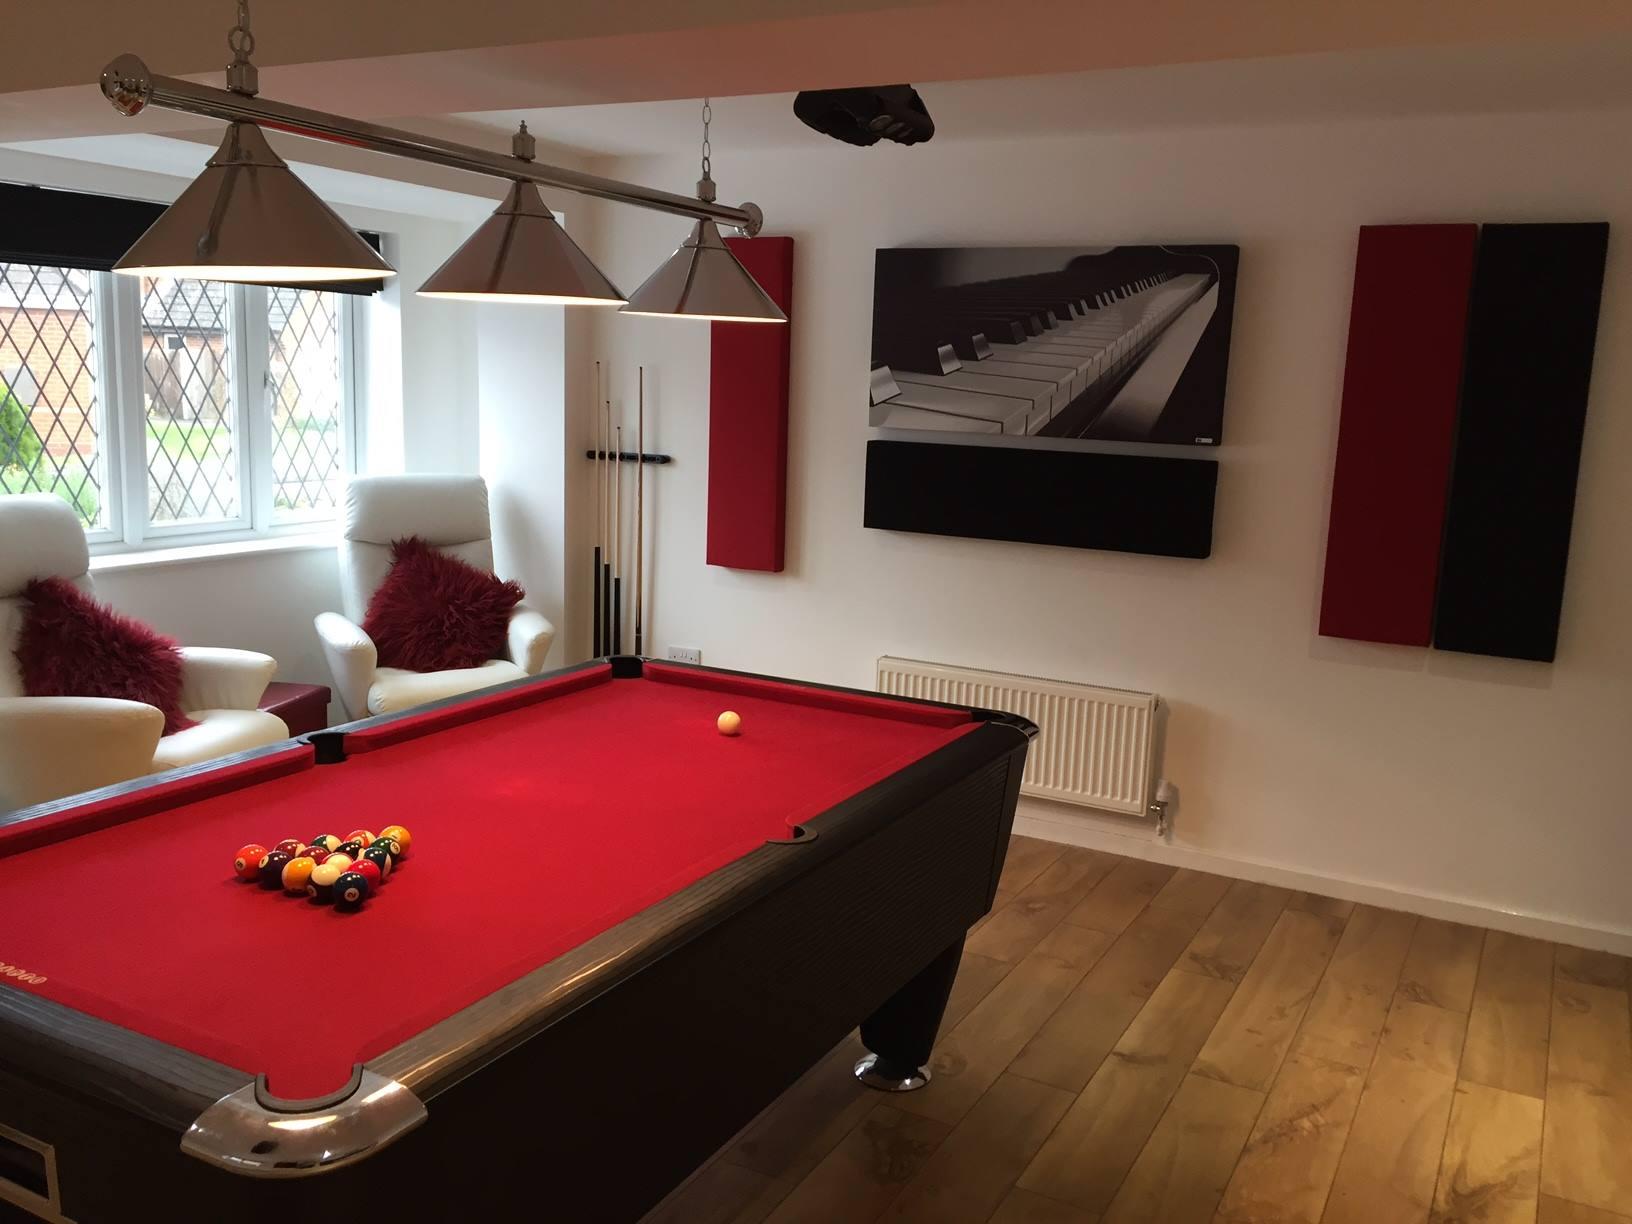 GIK Acoustics ArtPanel and Spot Panels billard room